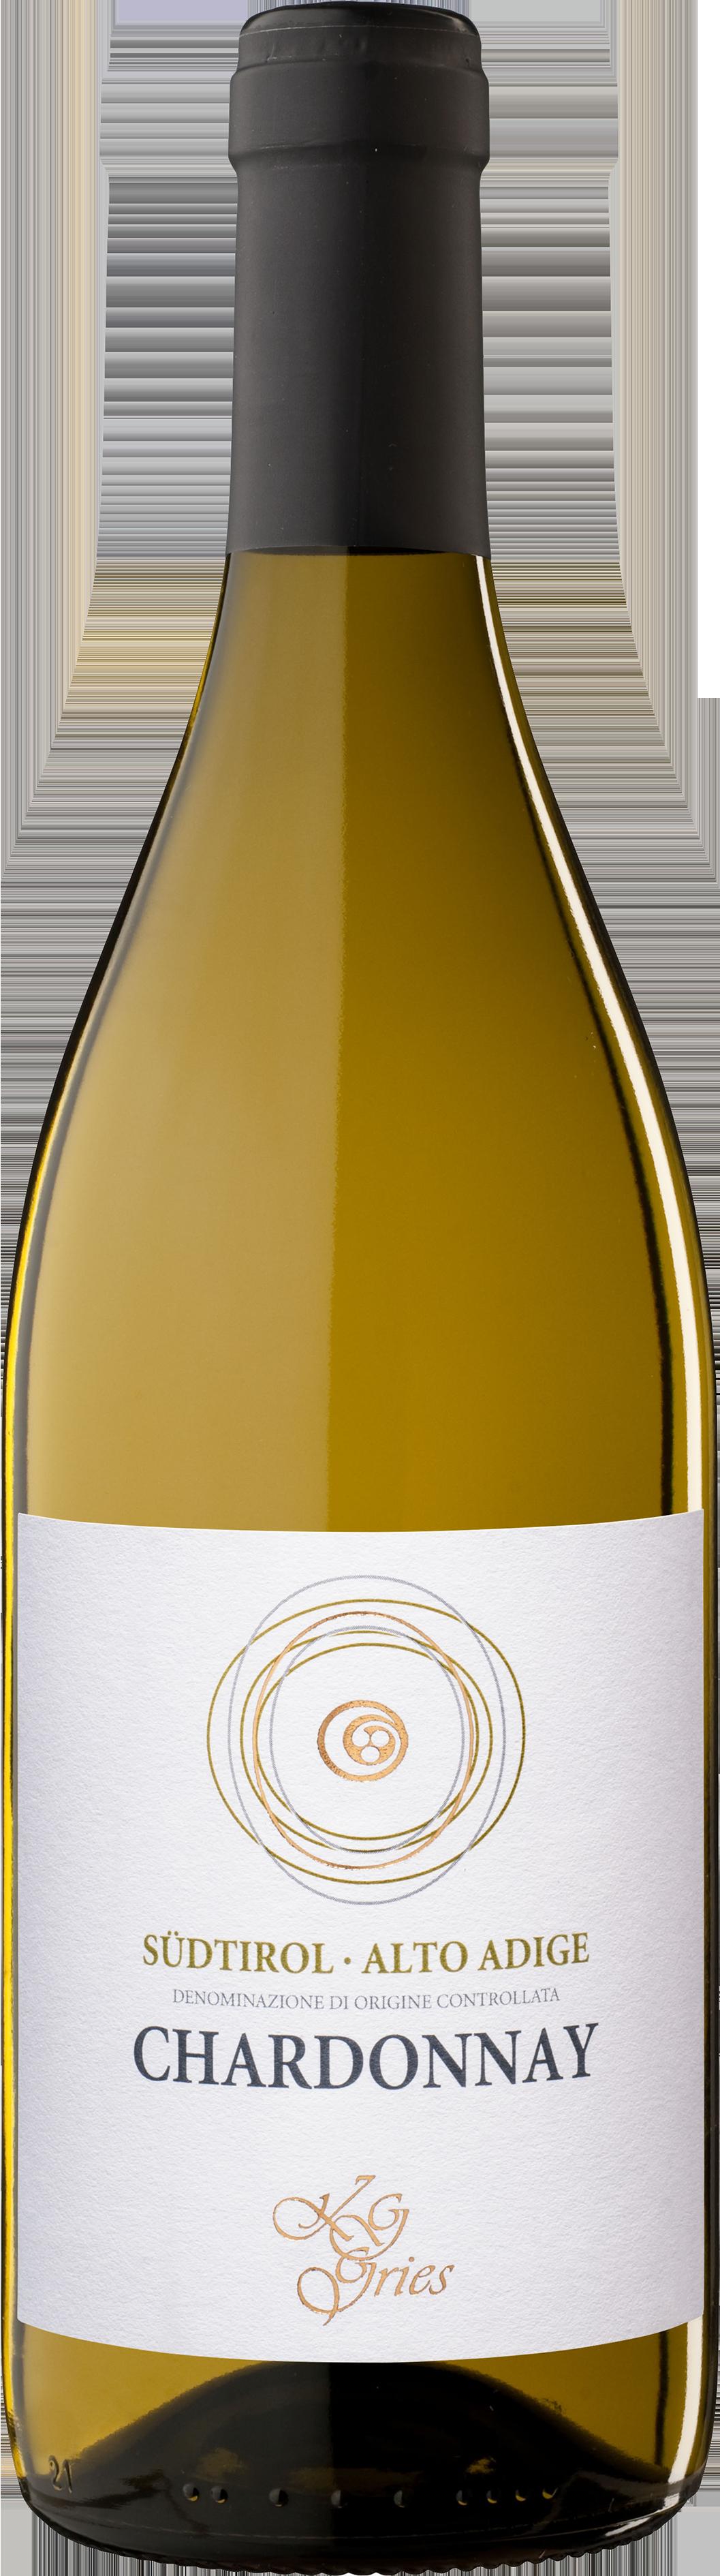 Gries-Chardonnay